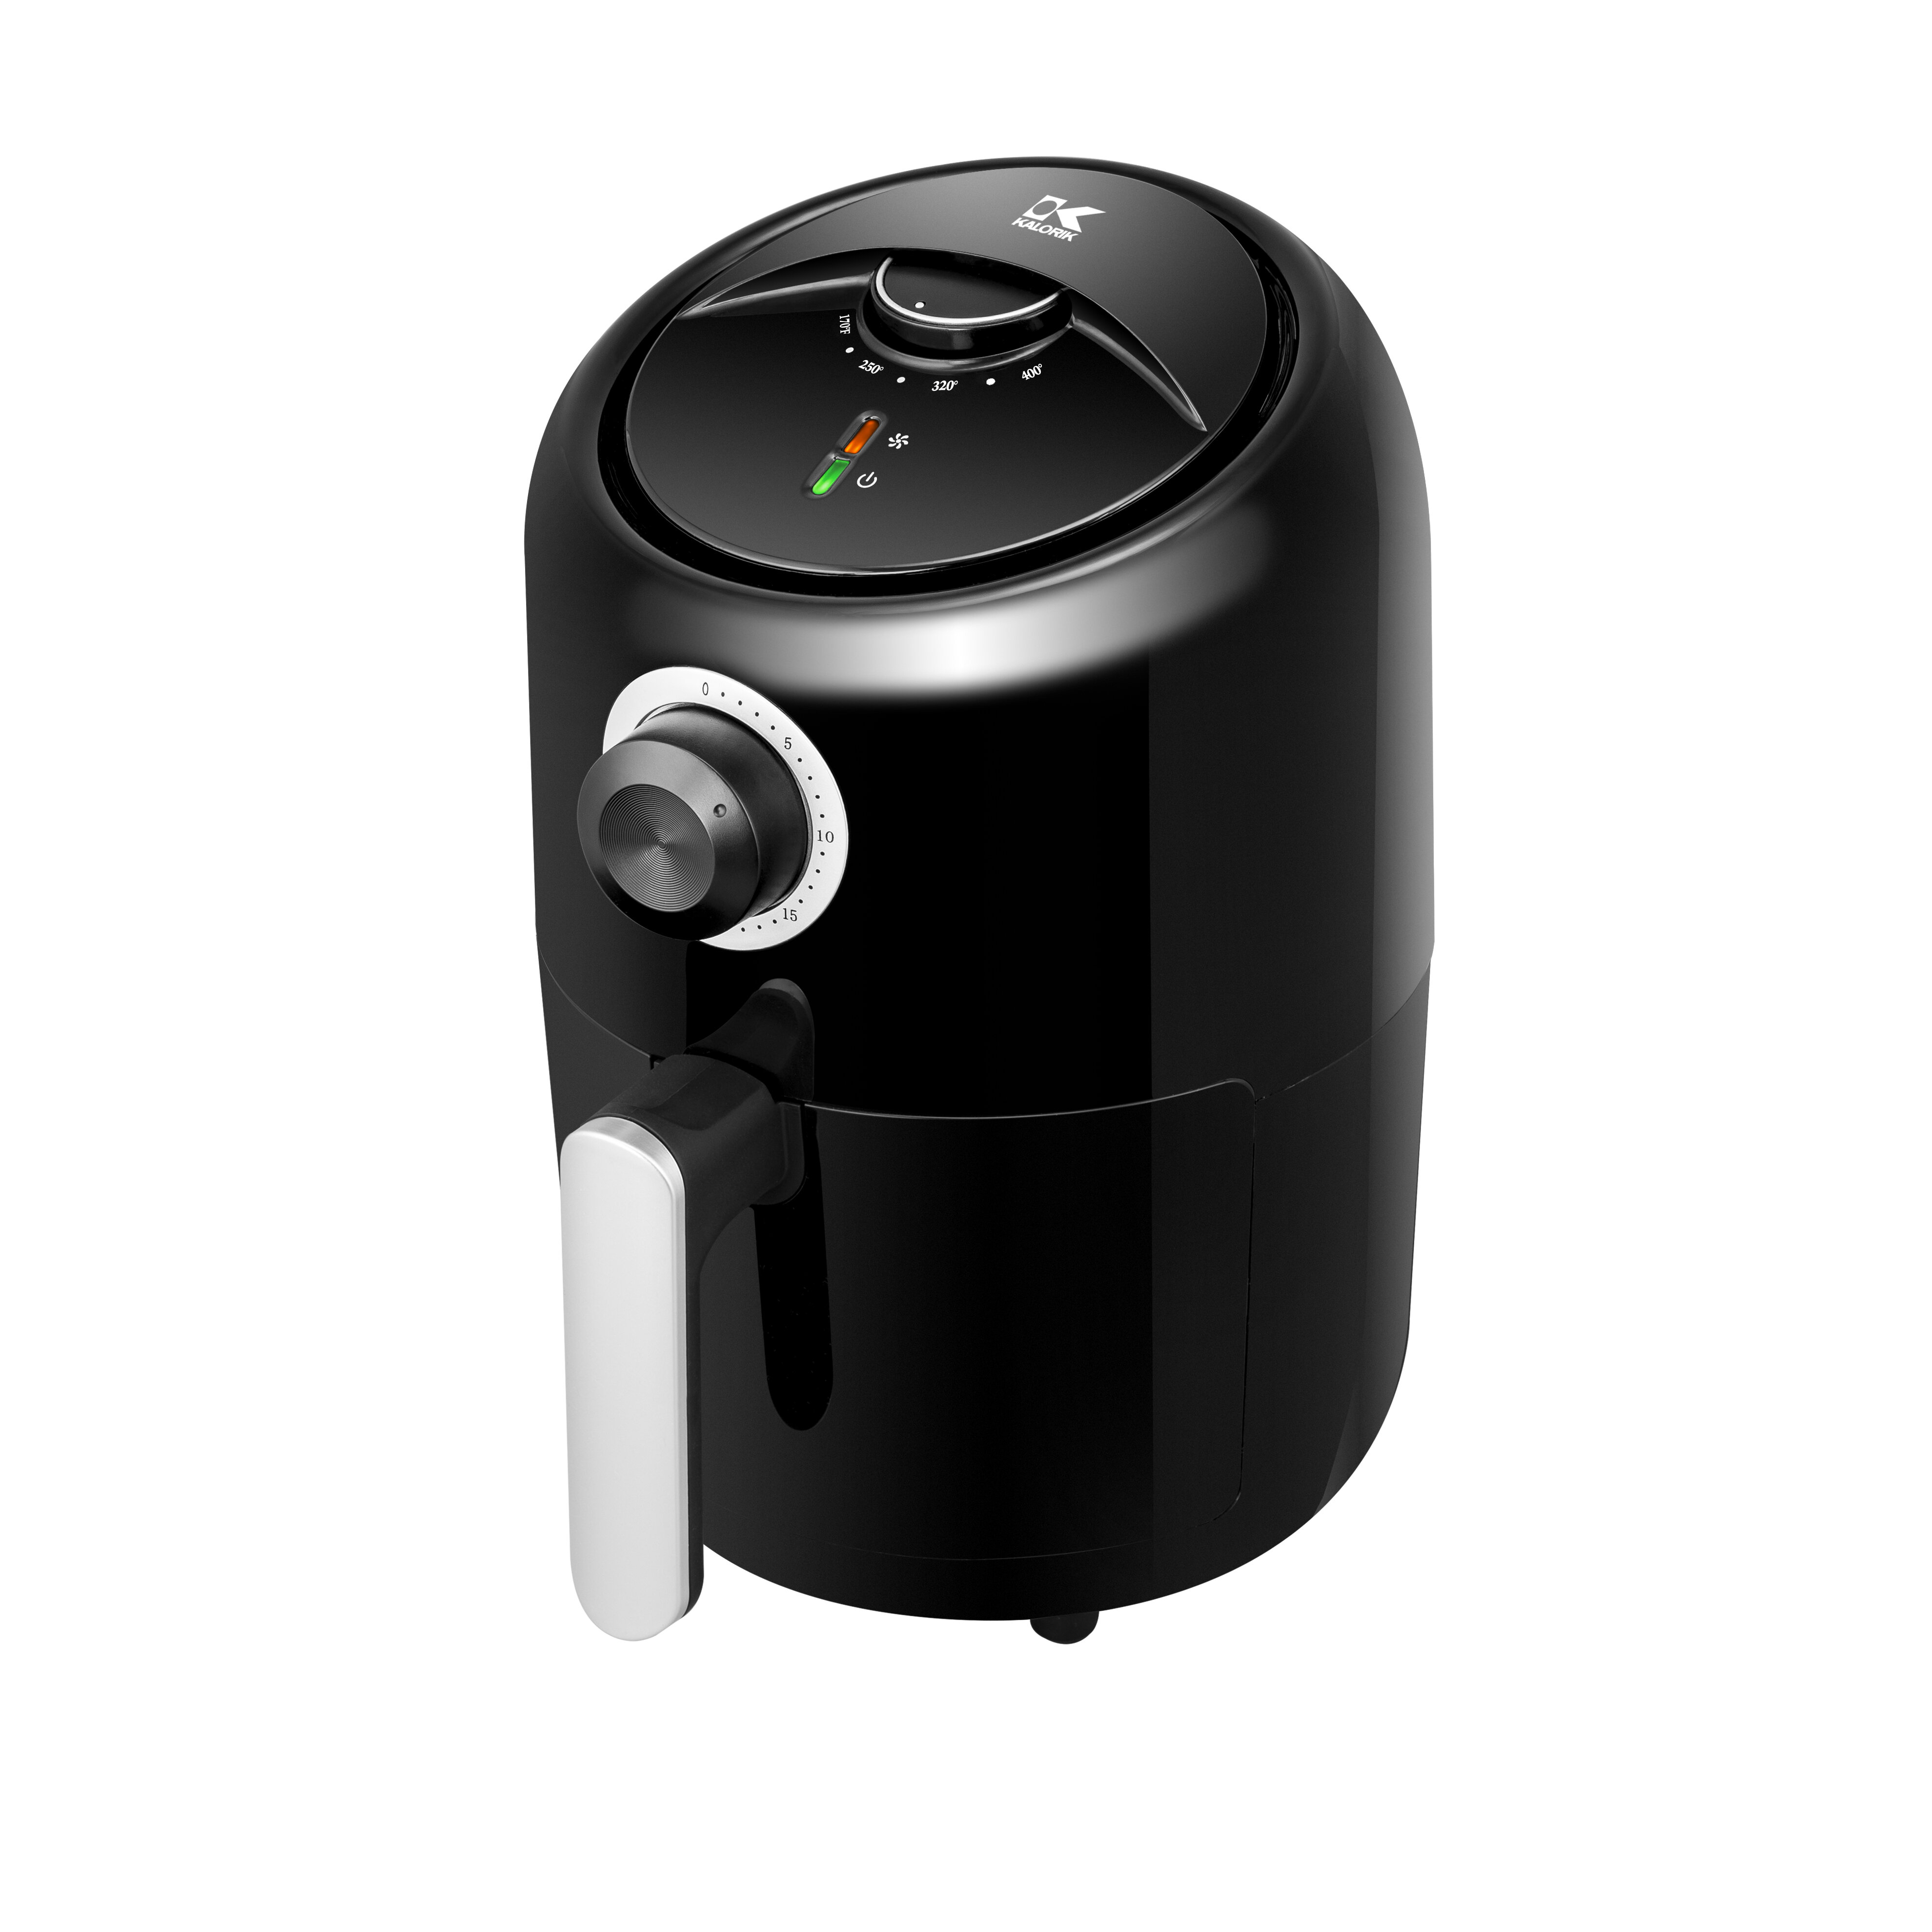 c4a4f16519d Kalorik 1.6 Liter Personal Air Fryer   Reviews